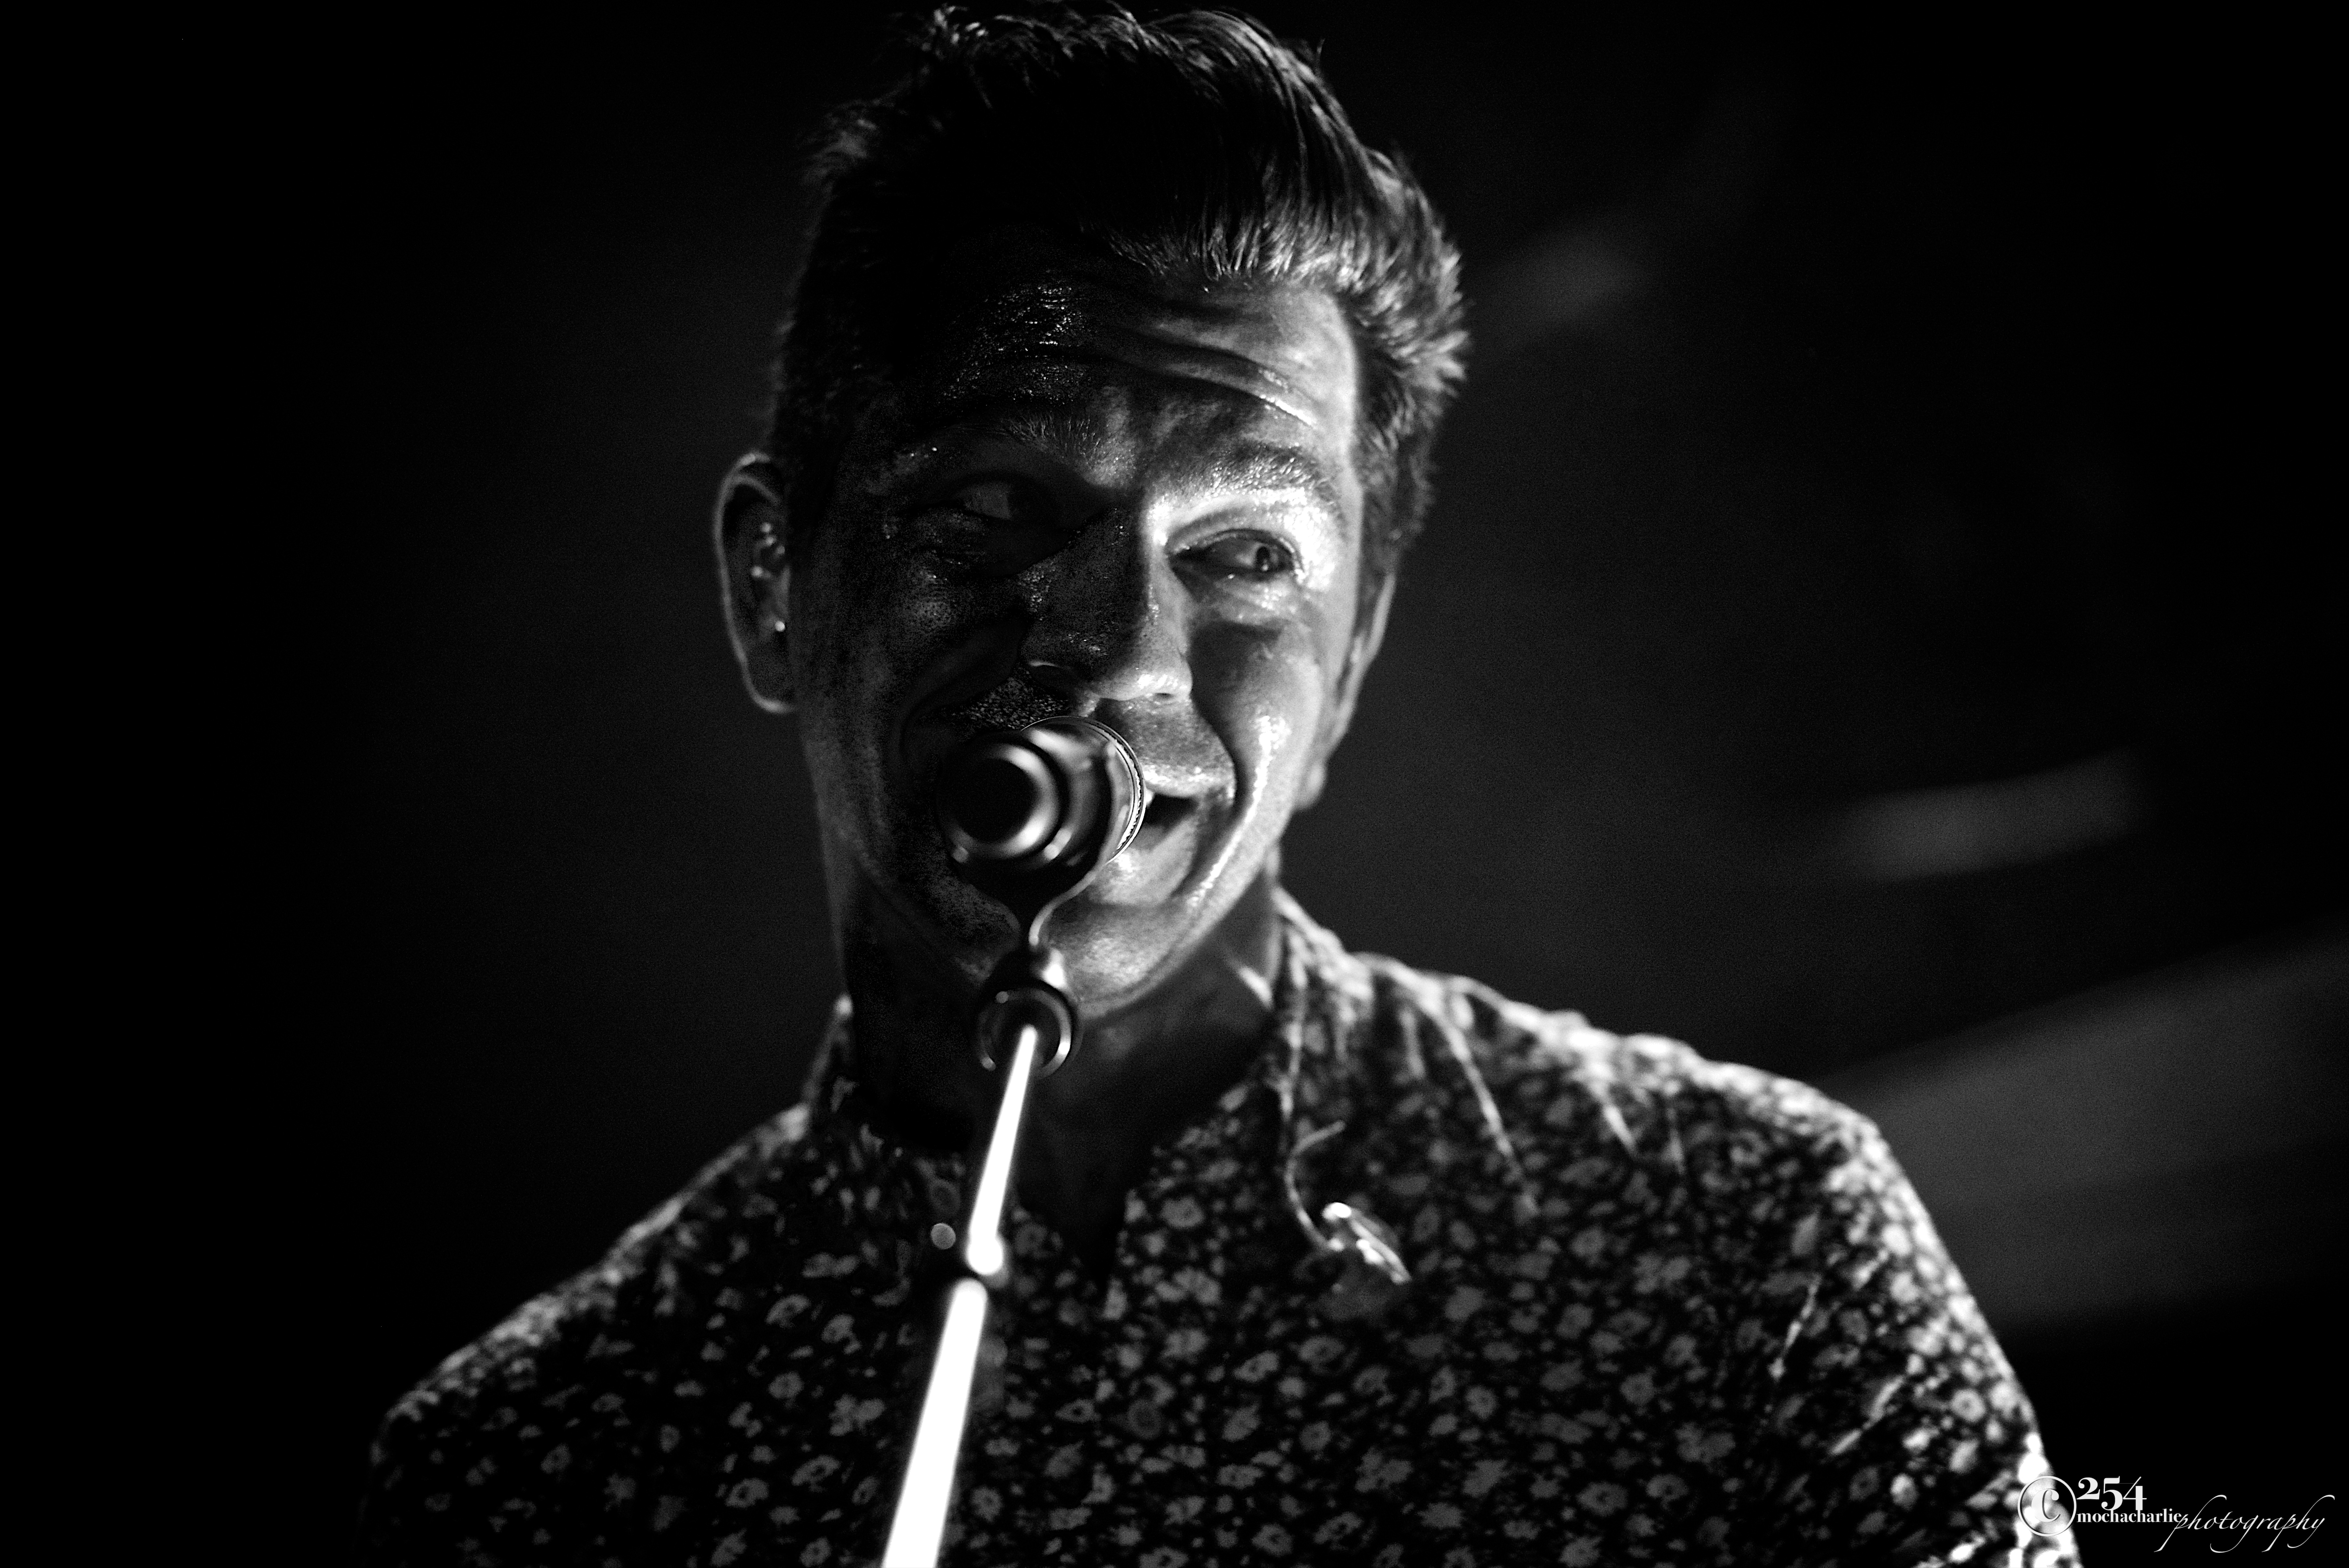 Andy Grammer at Neumos (Photo by Mocha Charlie)